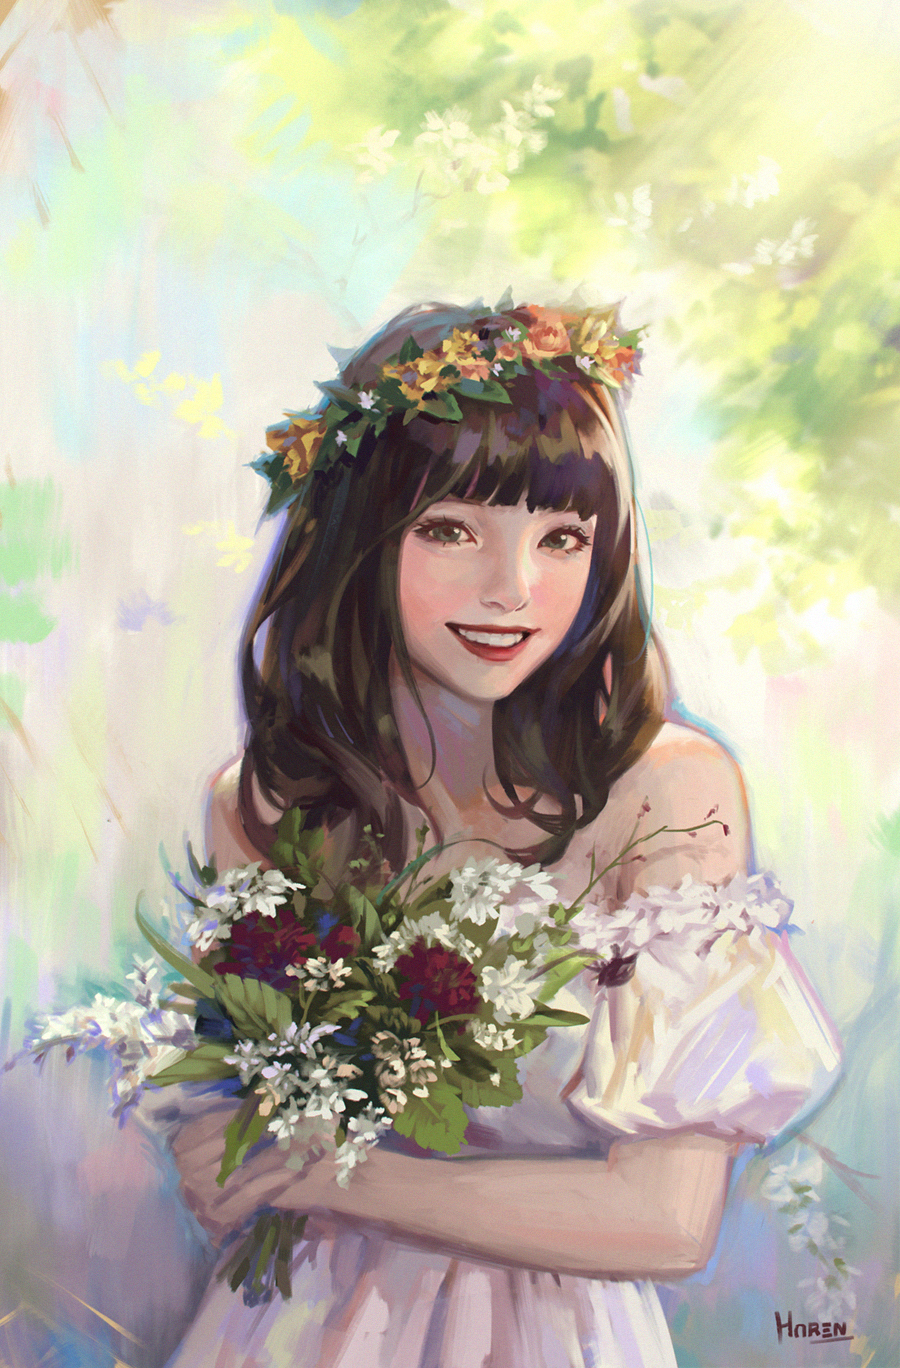 https://orig00.deviantart.net/e711/f/2017/305/6/3/7face_07_by_hanseul_kim-dbsgp0j.jpg